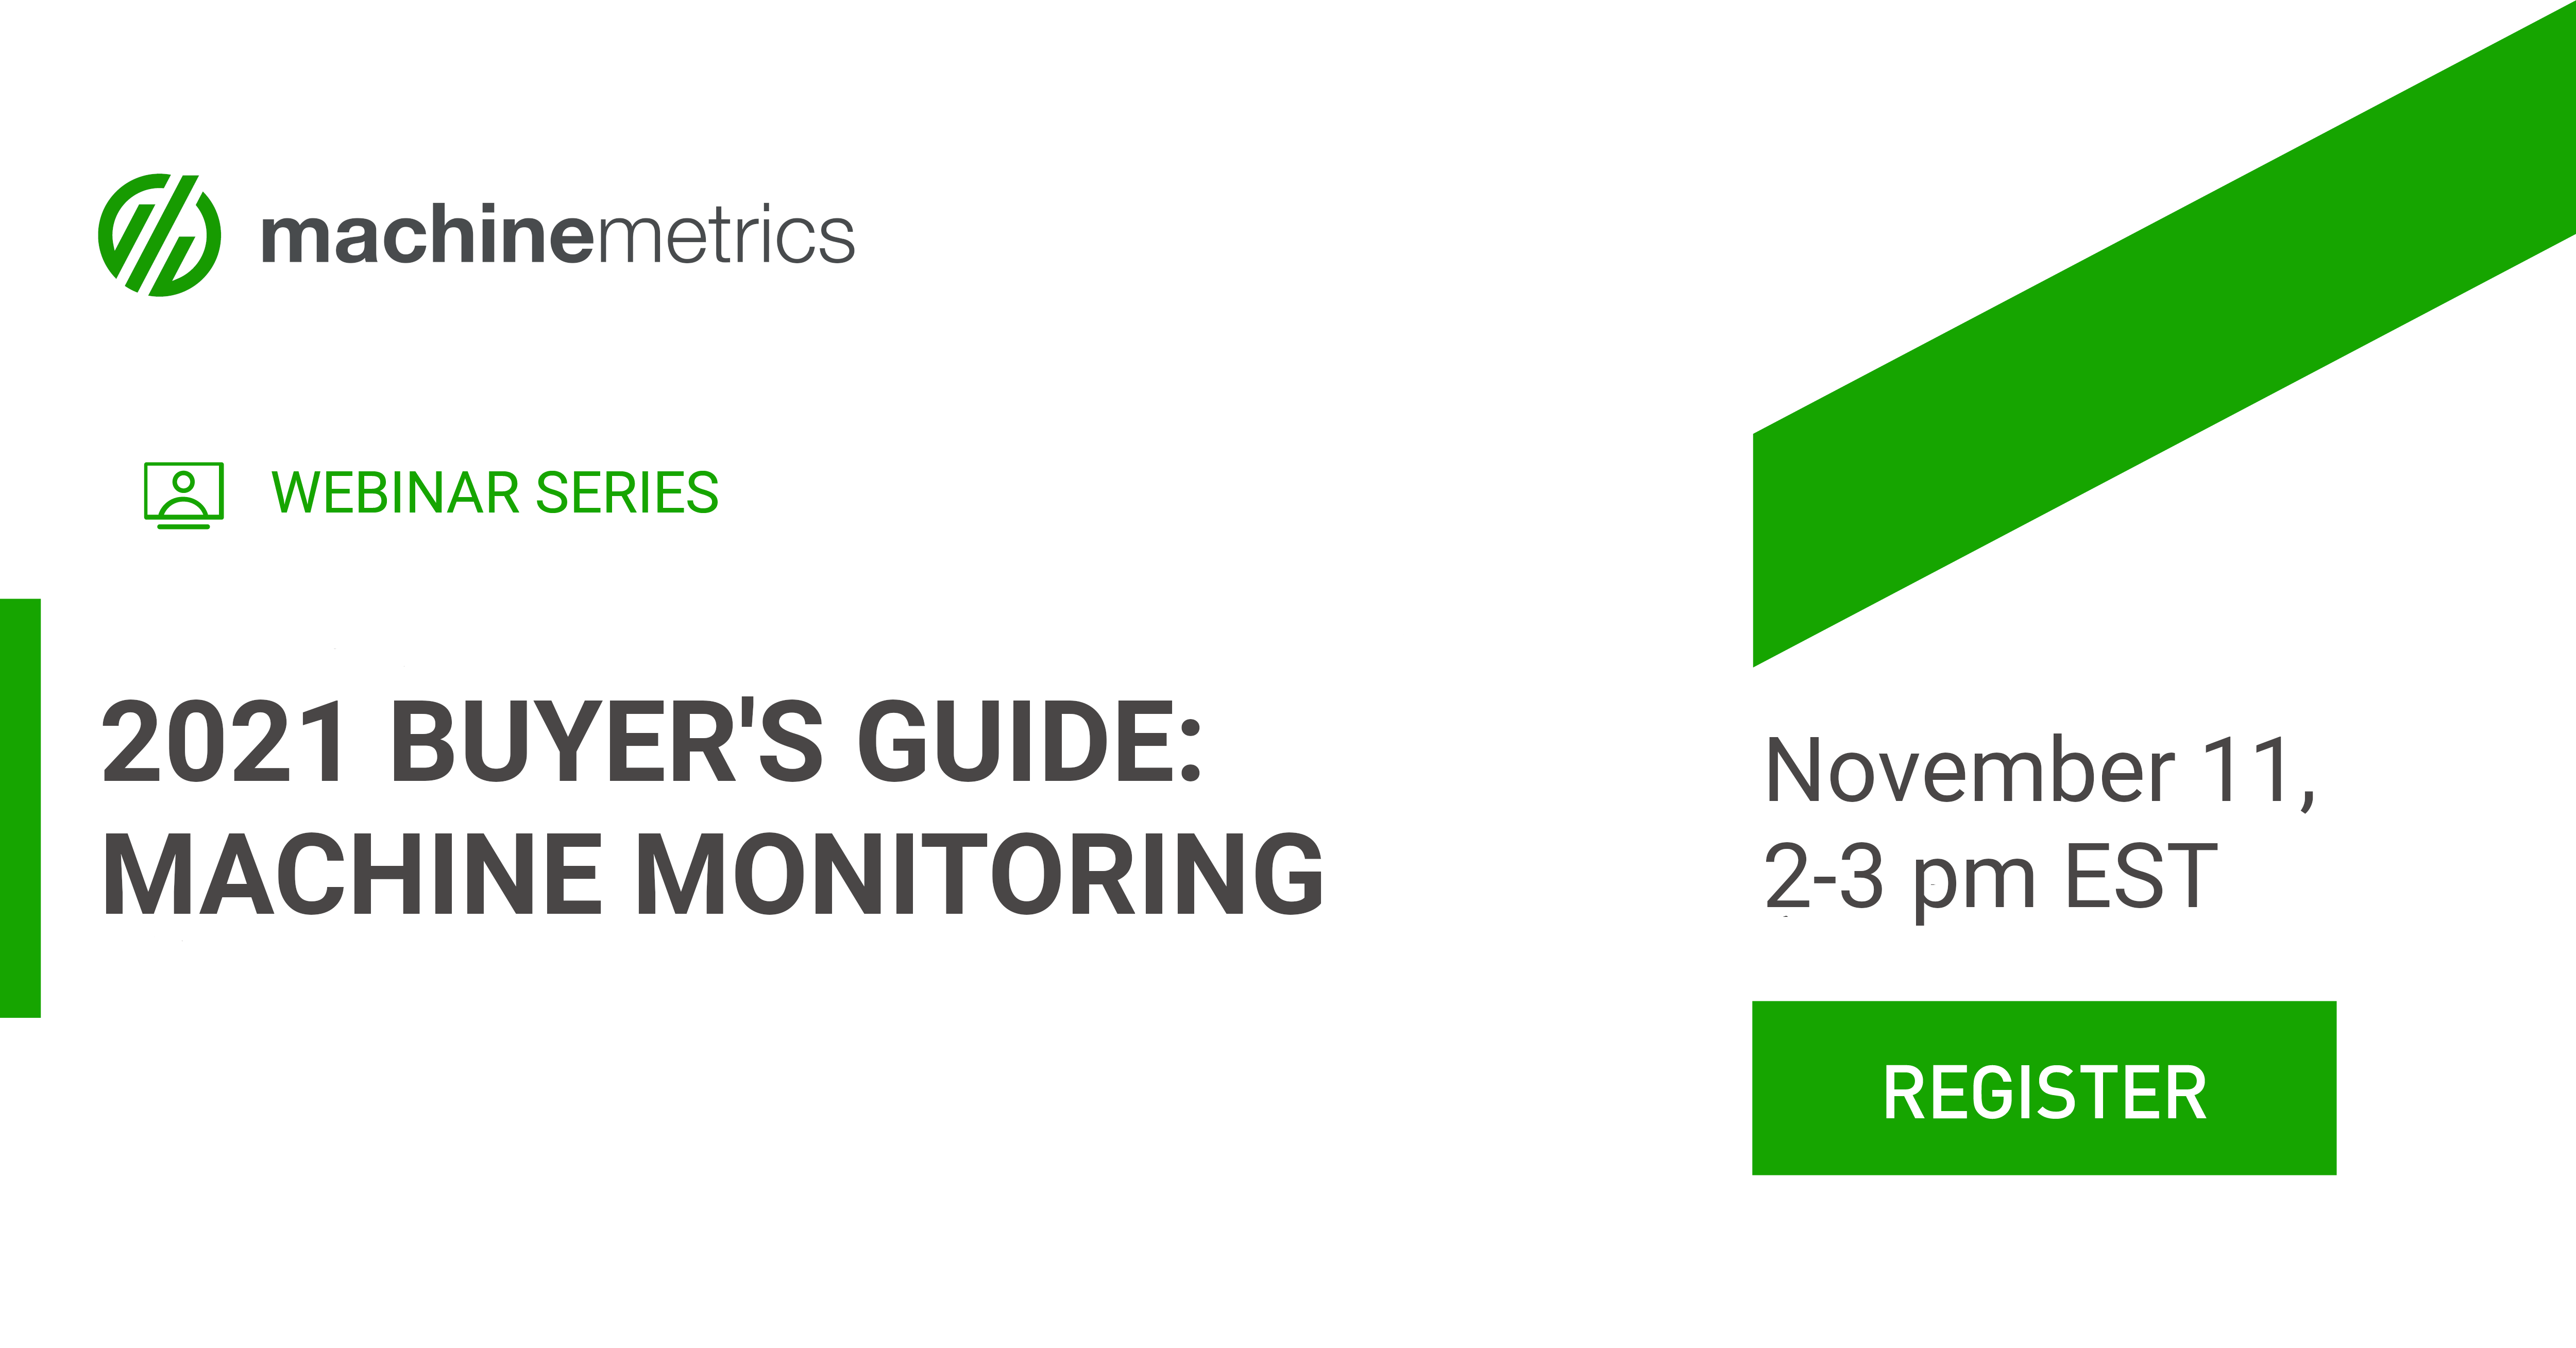 Buyers Guide to Machine Monitoring Webinar Meta Image